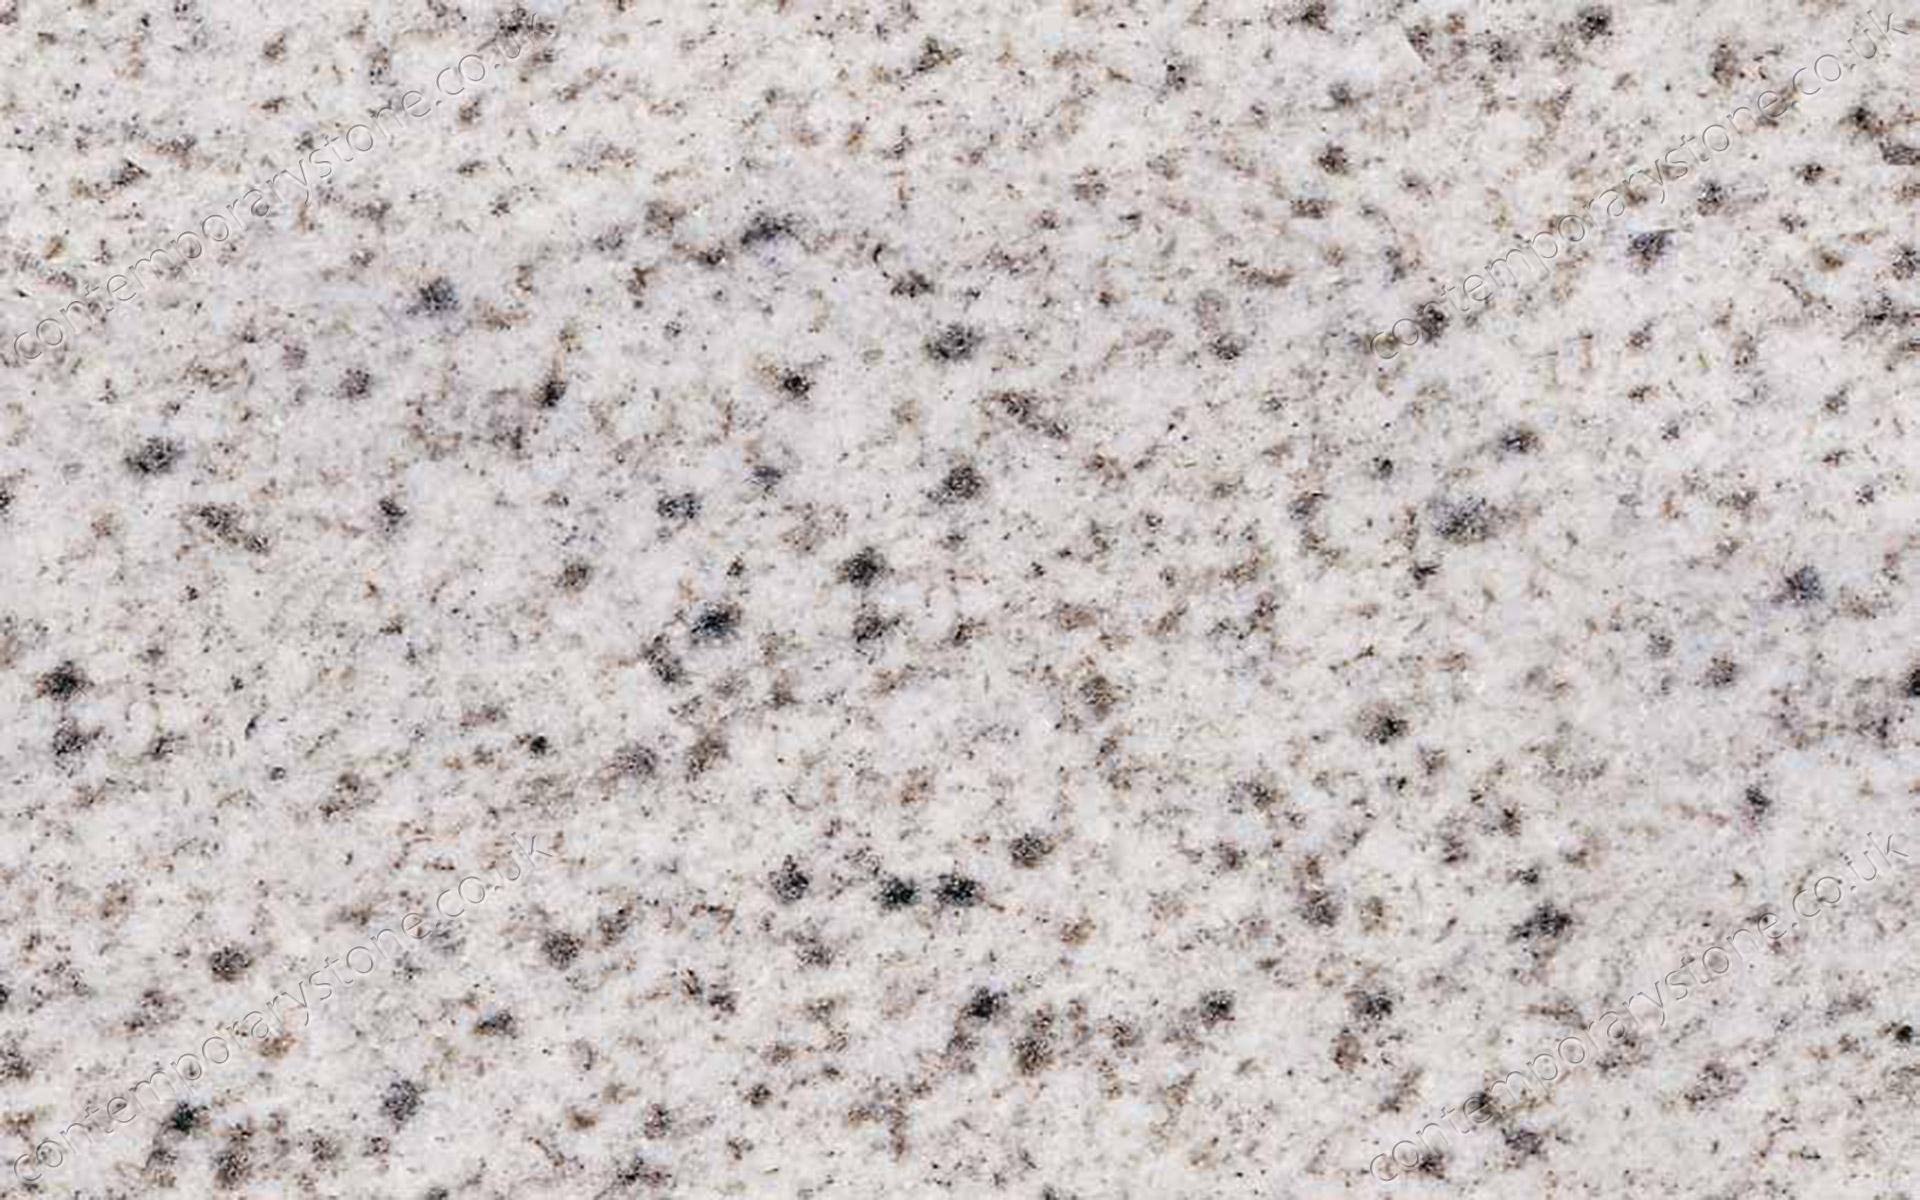 Bethel White granite close-up